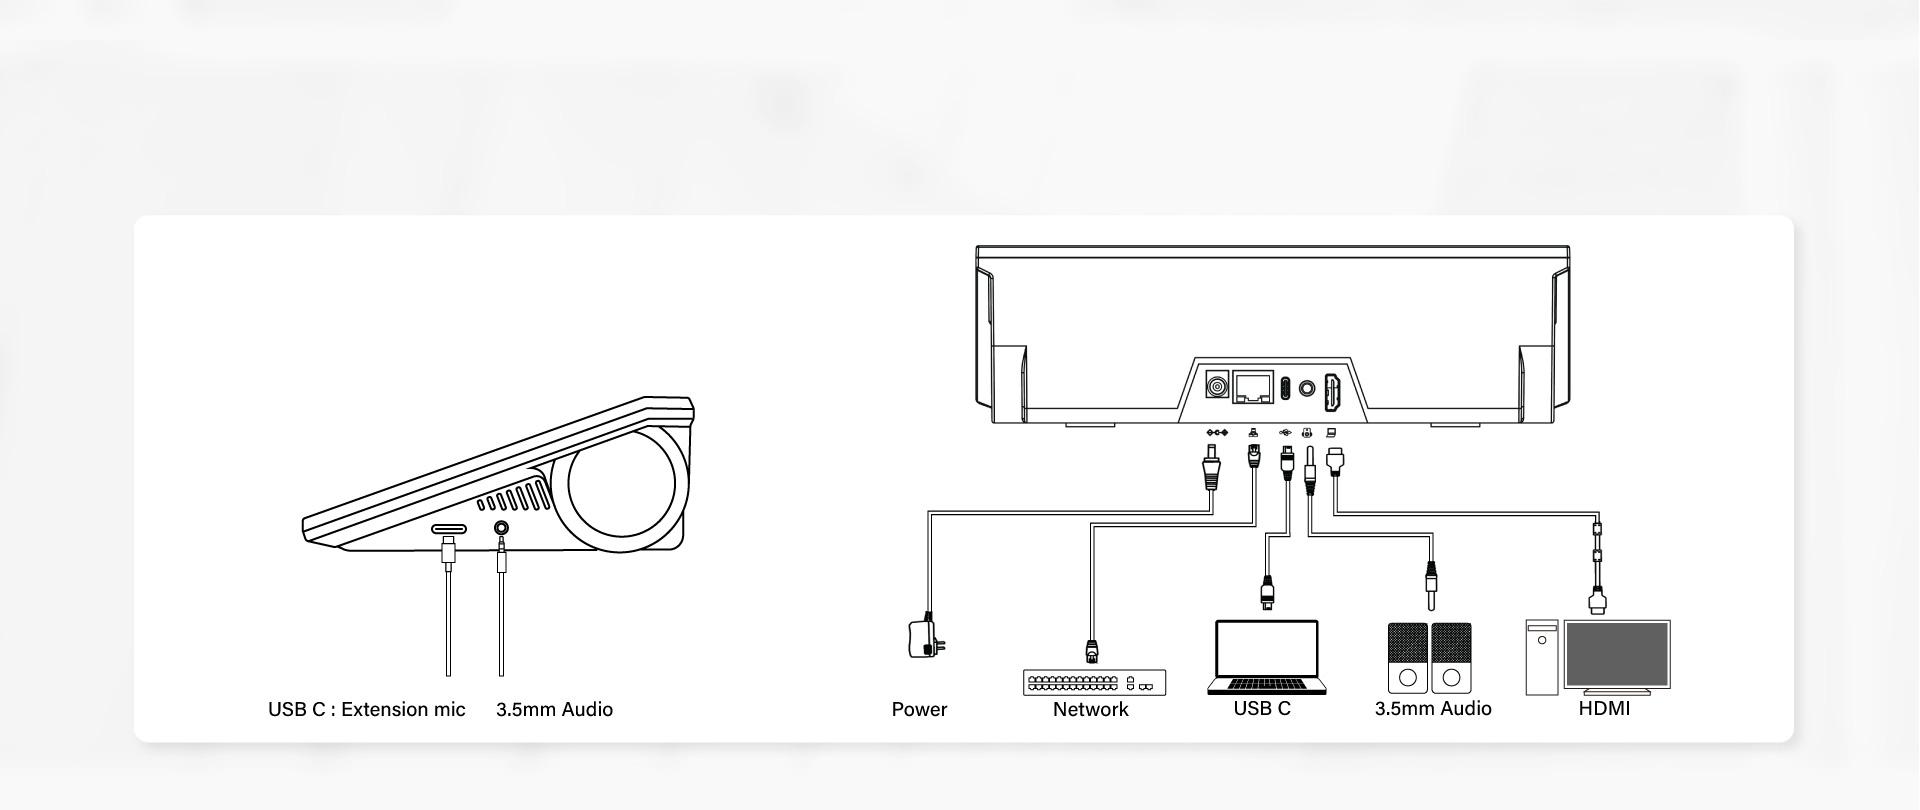 iSpeaker CM800 speakerphone with Android